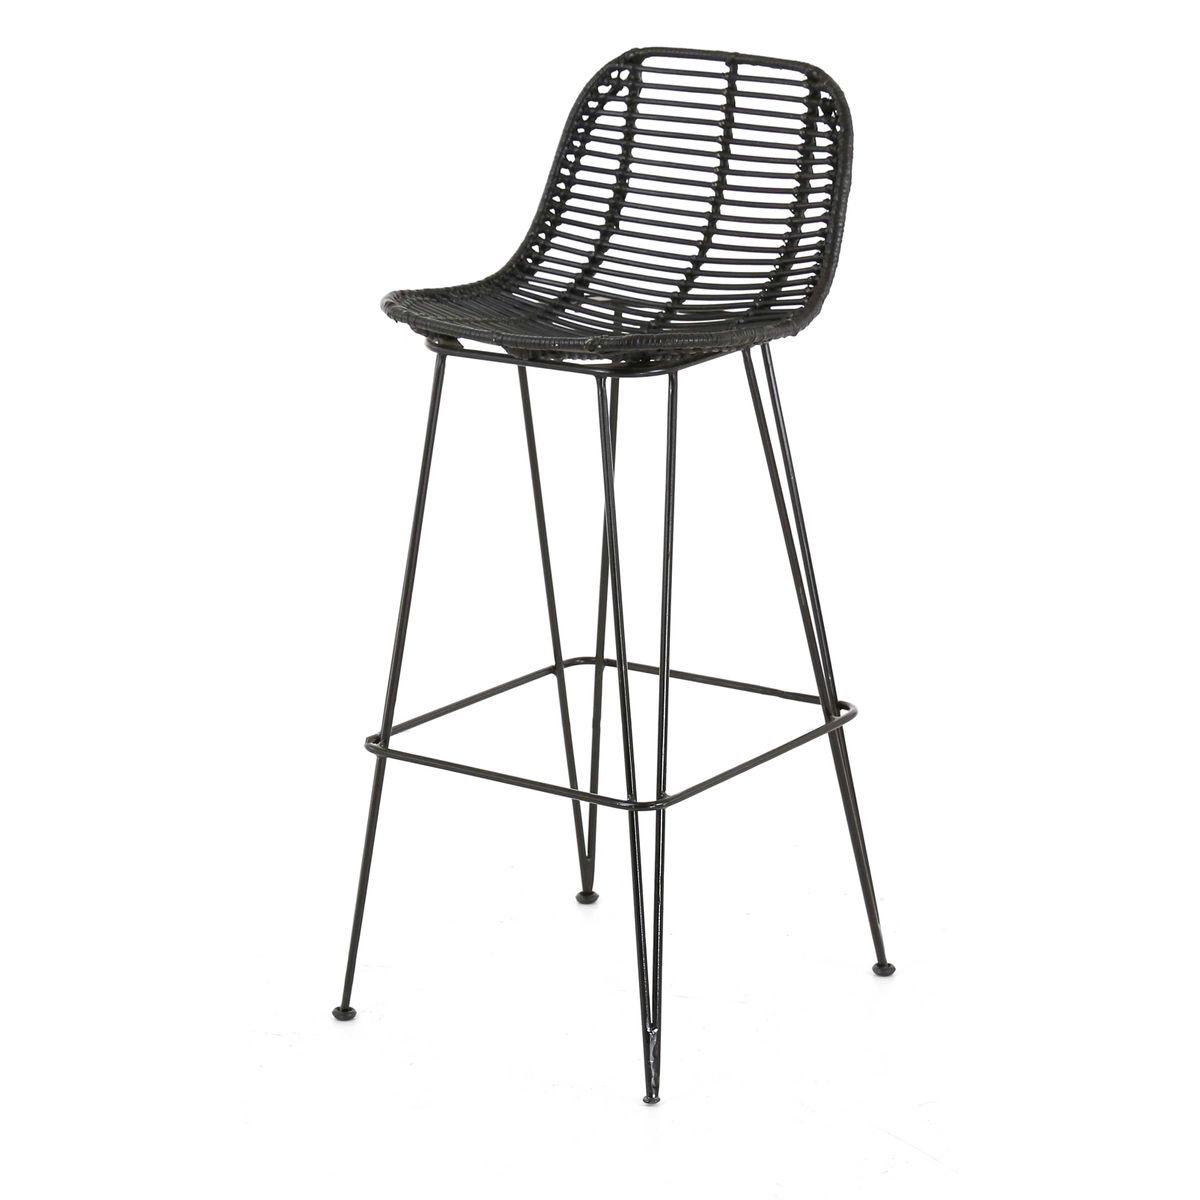 2x tabouret de bar kubu fresh zago store for Chaise de bar en osier